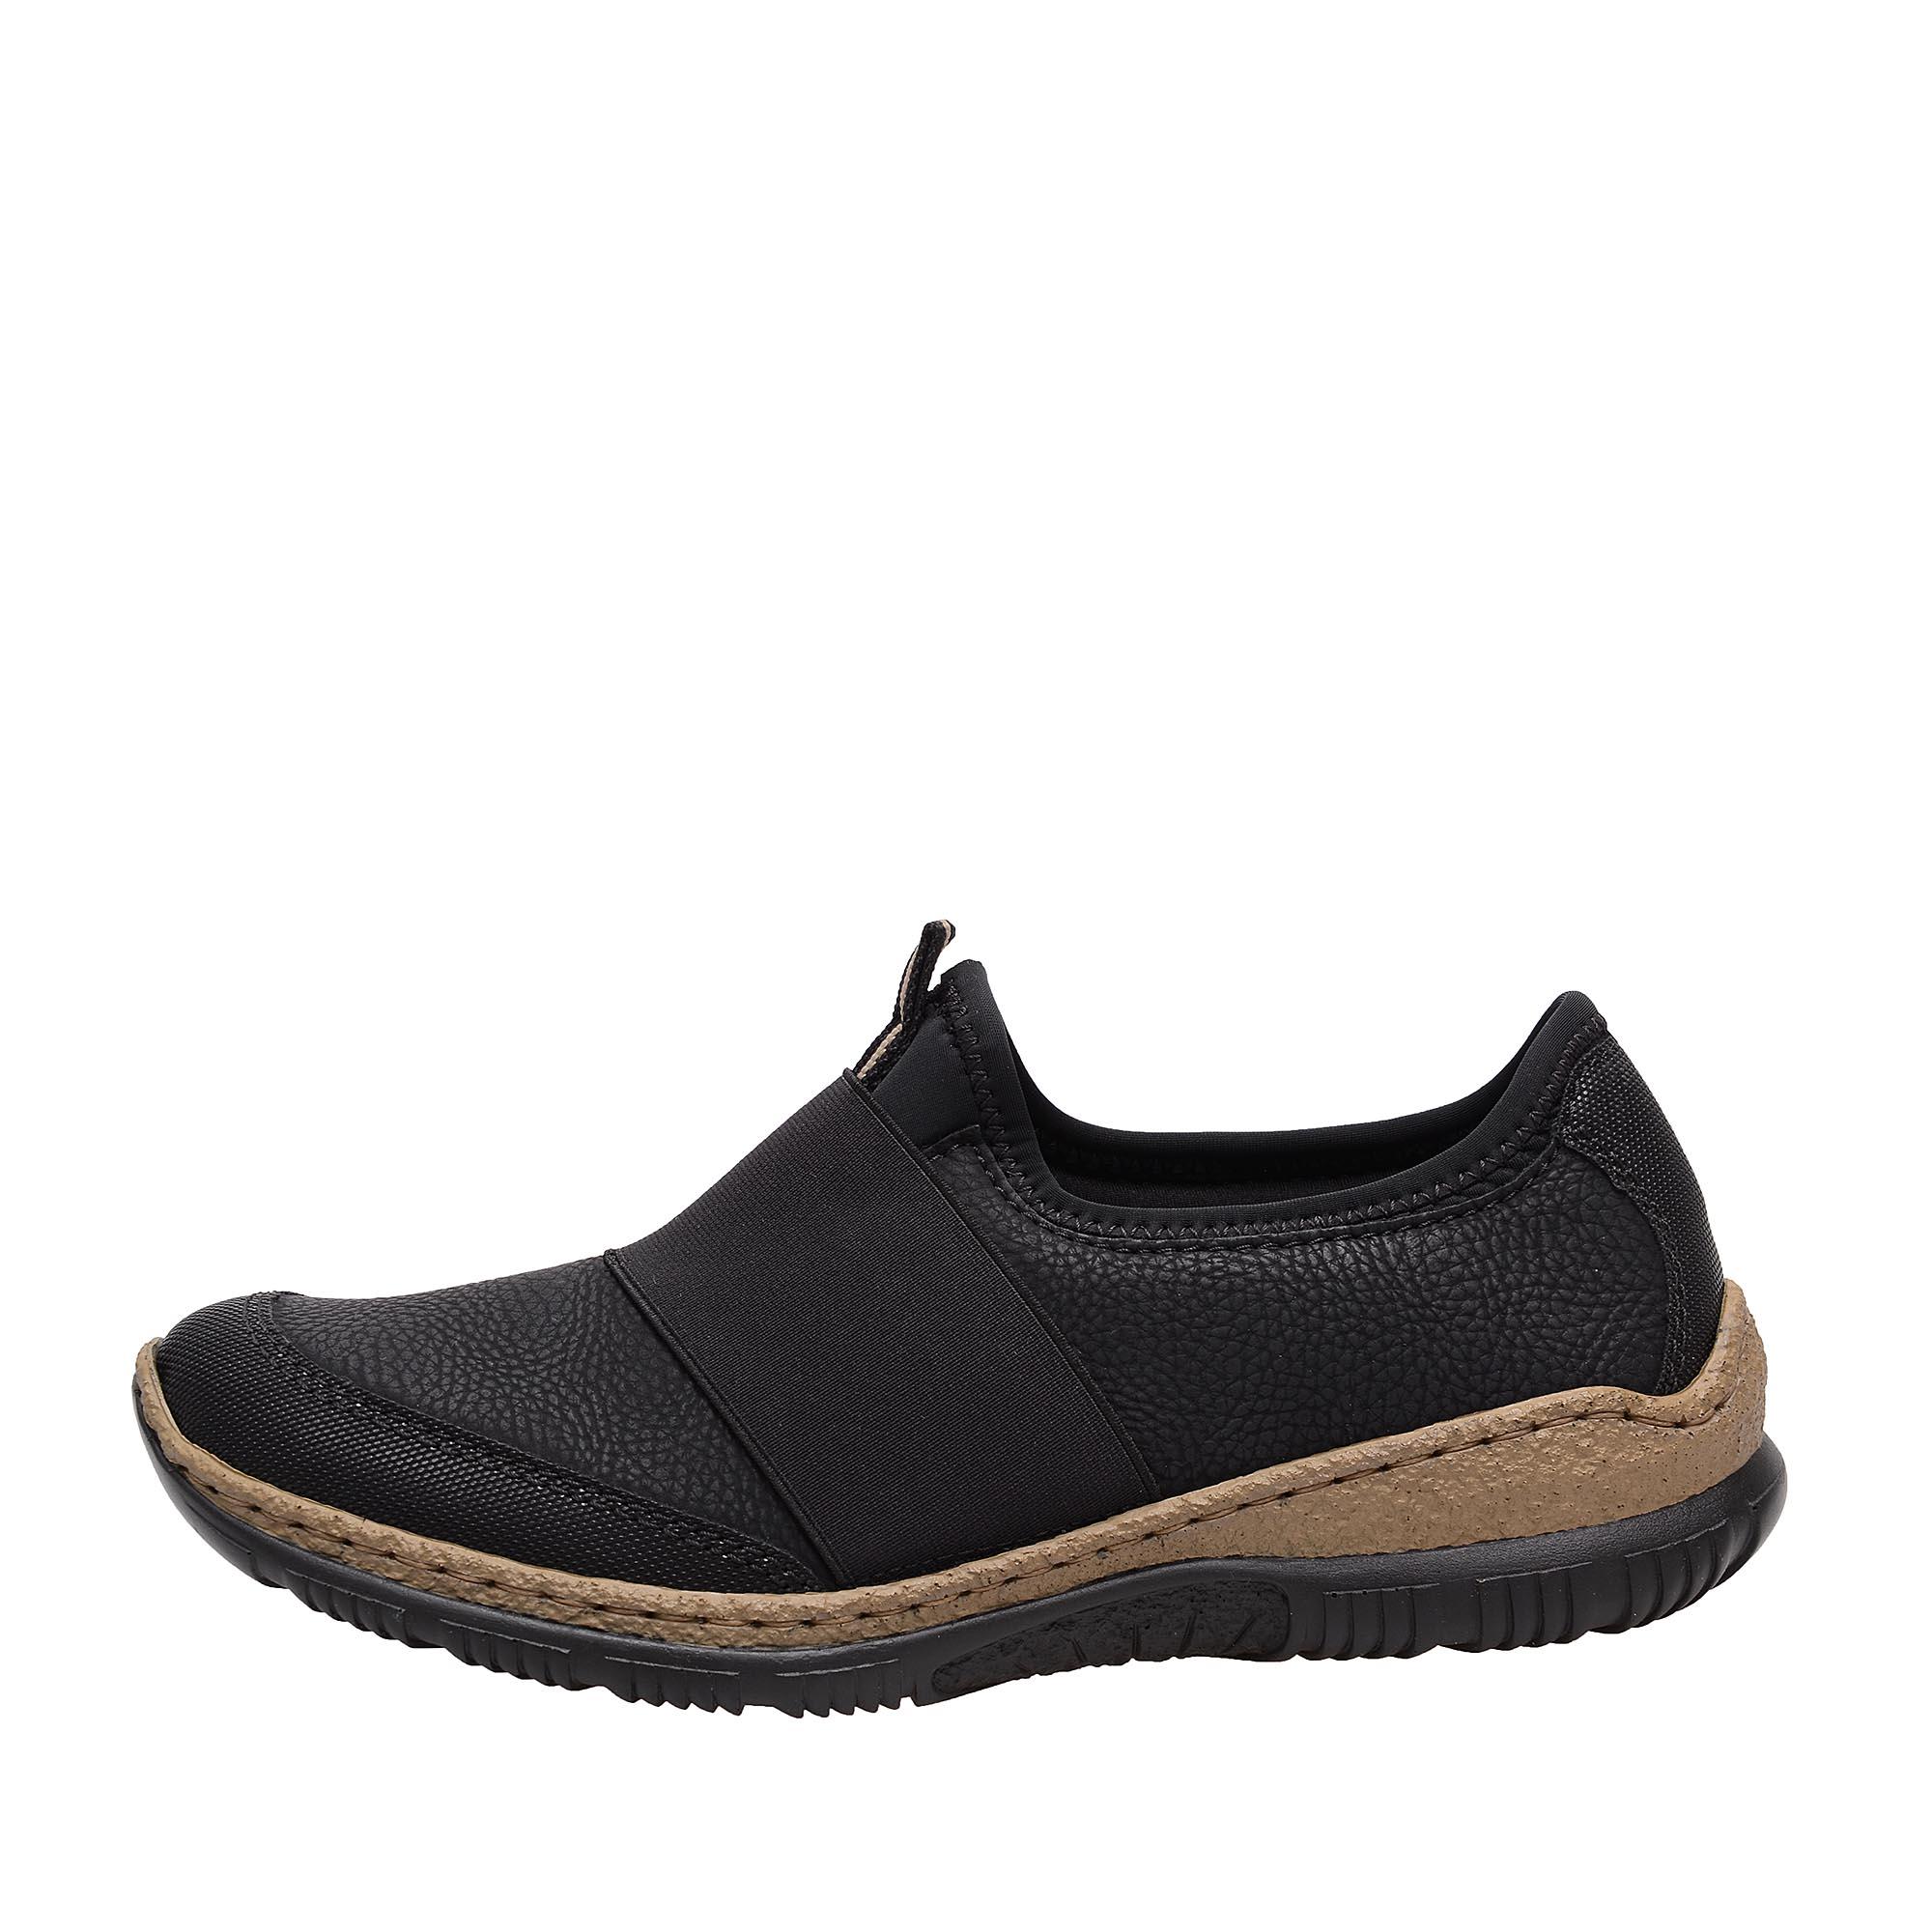 Dámská obuv RIEKER N3291 00 SCHWARZ H W 7  632469746ff